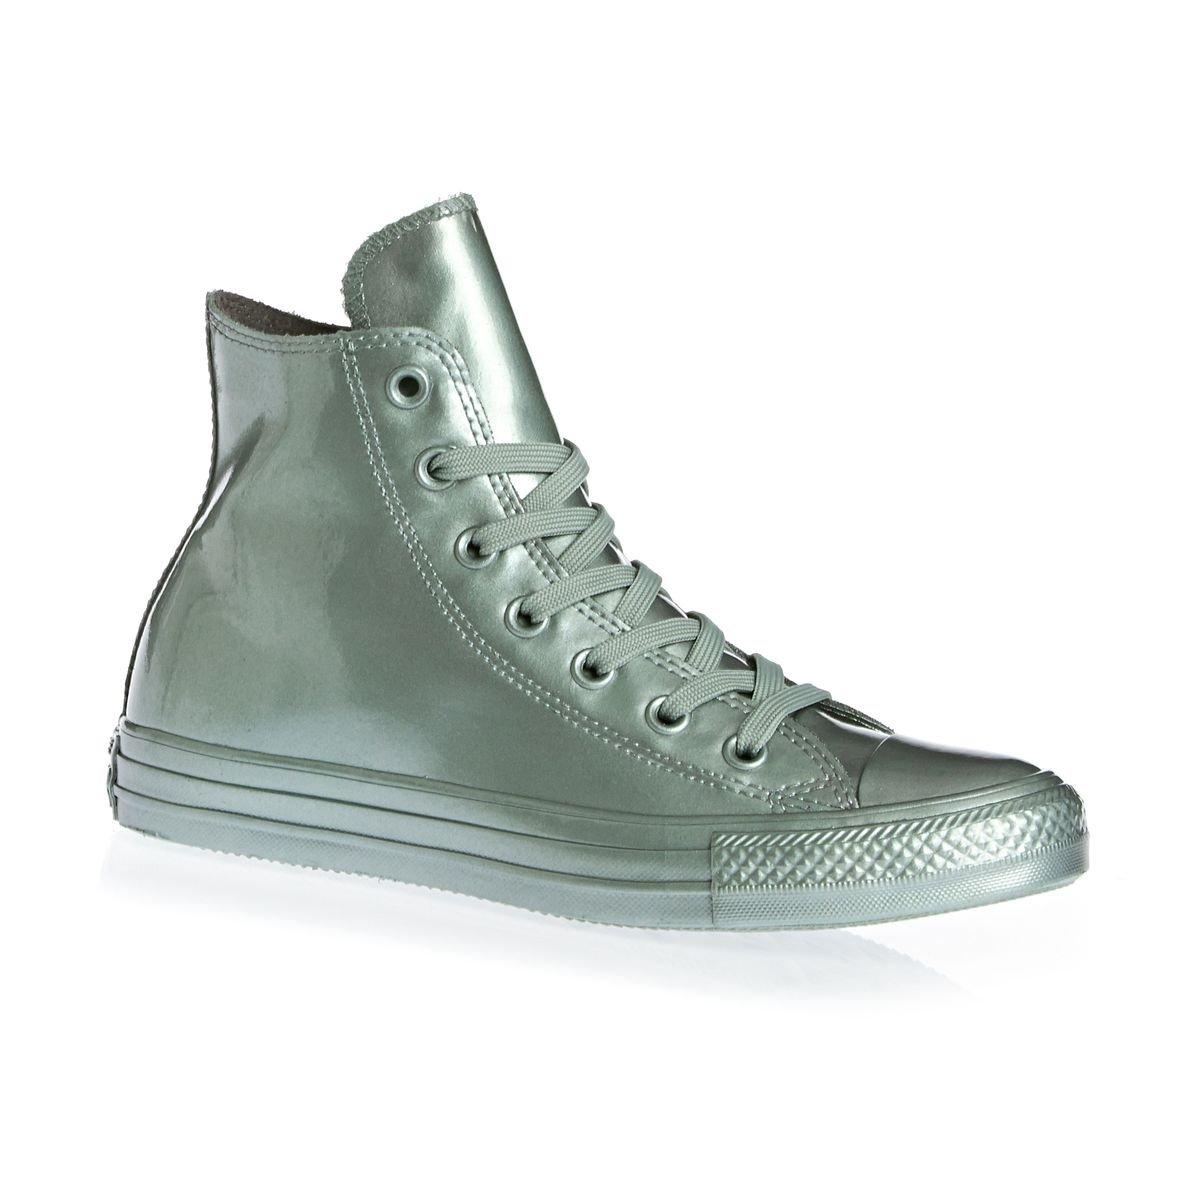 Converse AS Hi Can charcoal 1J793 Unisex-Erwachsene Sneaker  36 EU|Silber